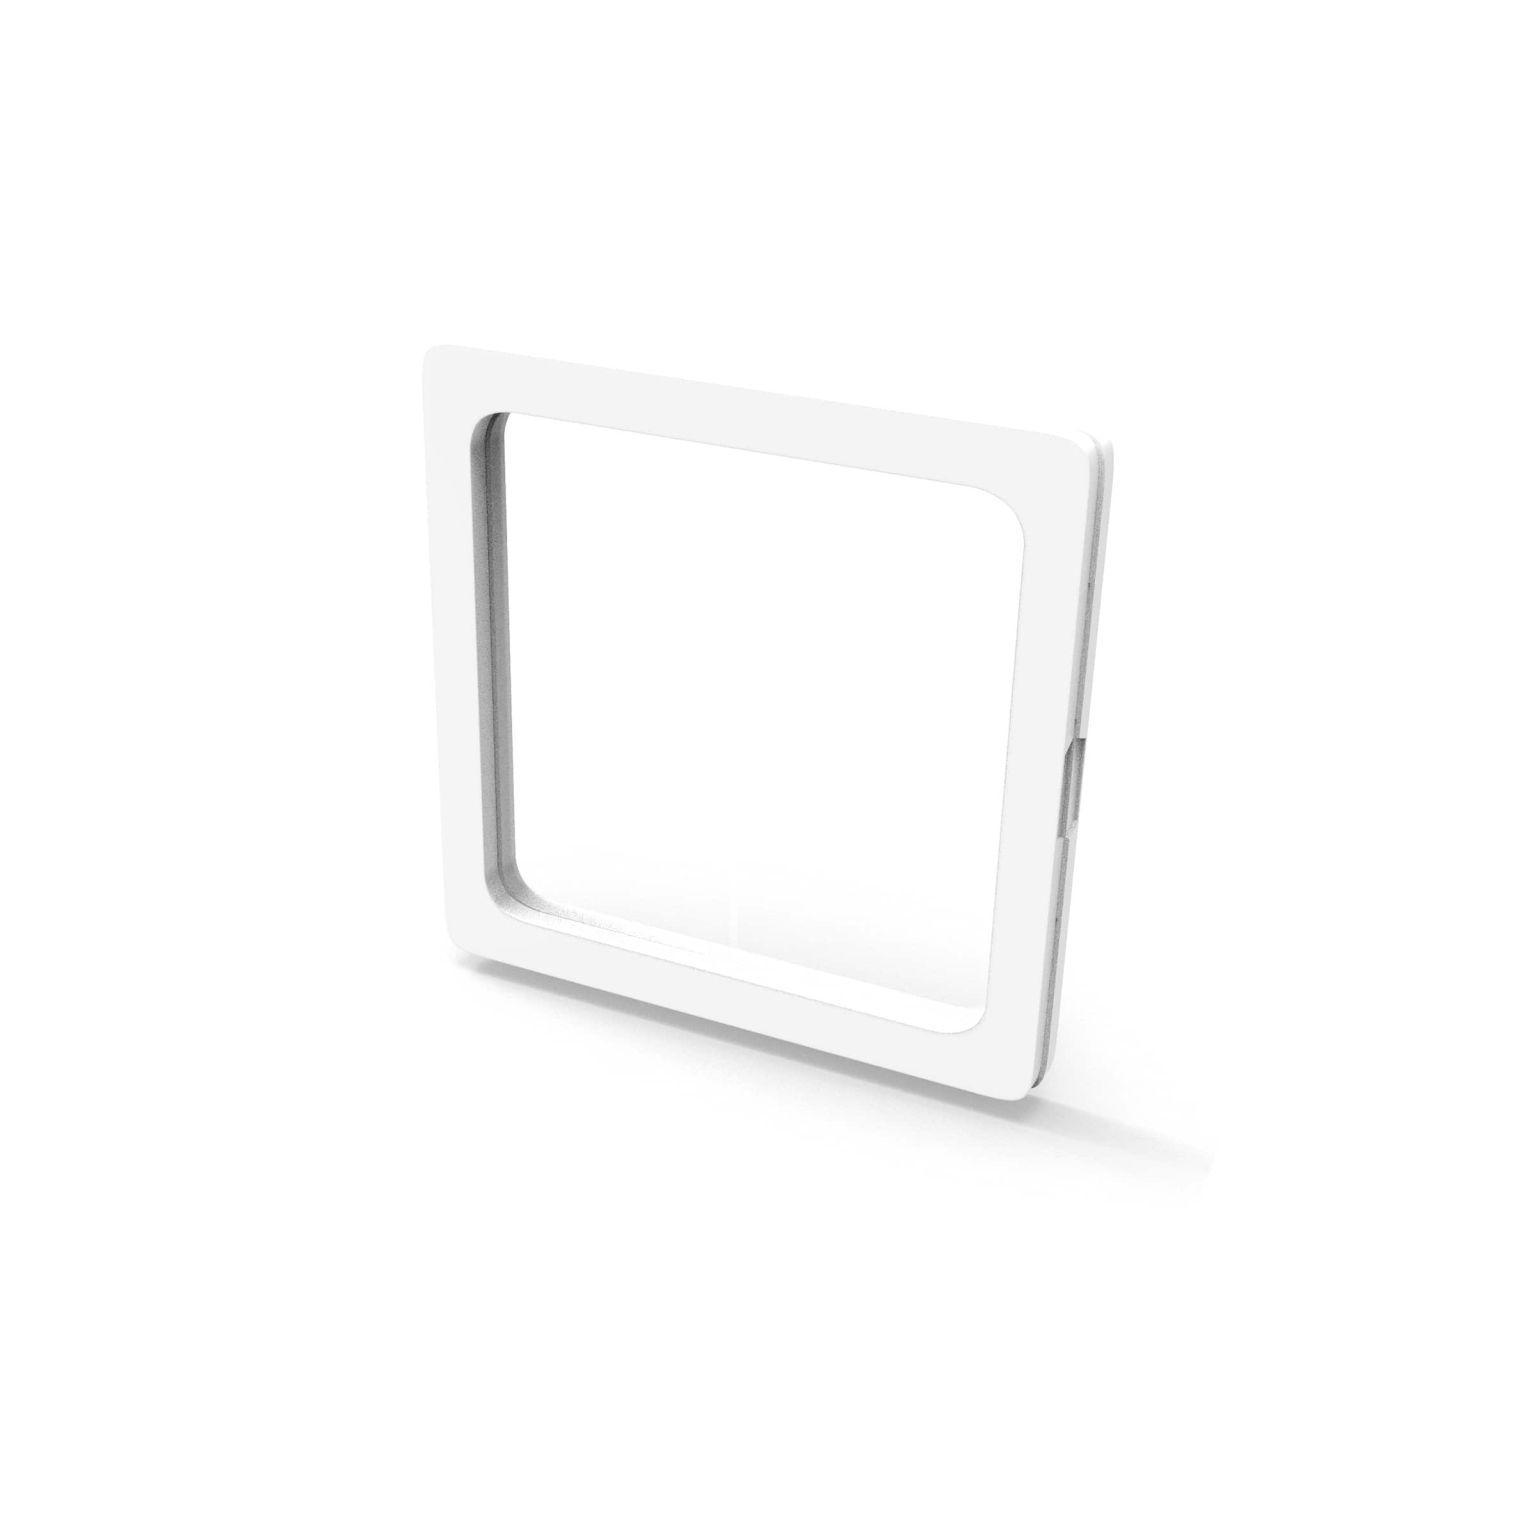 Gift Box Frame 7 x 7 x 2 cm Blanc